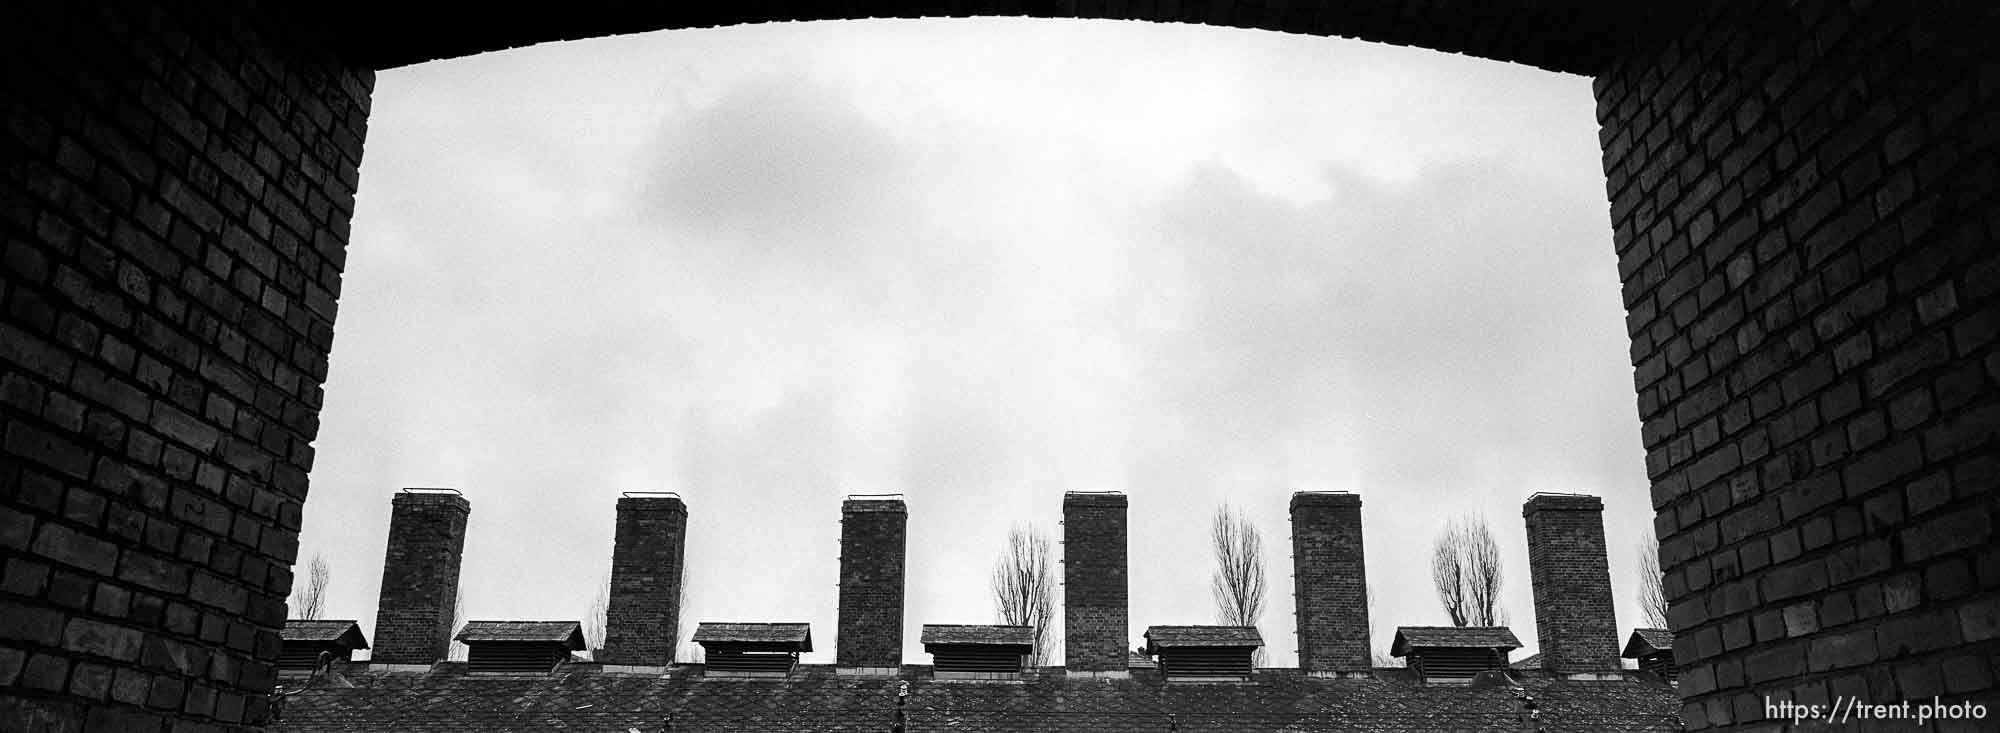 Kitchen chimneys at the Auschwitz Concentration Camp.